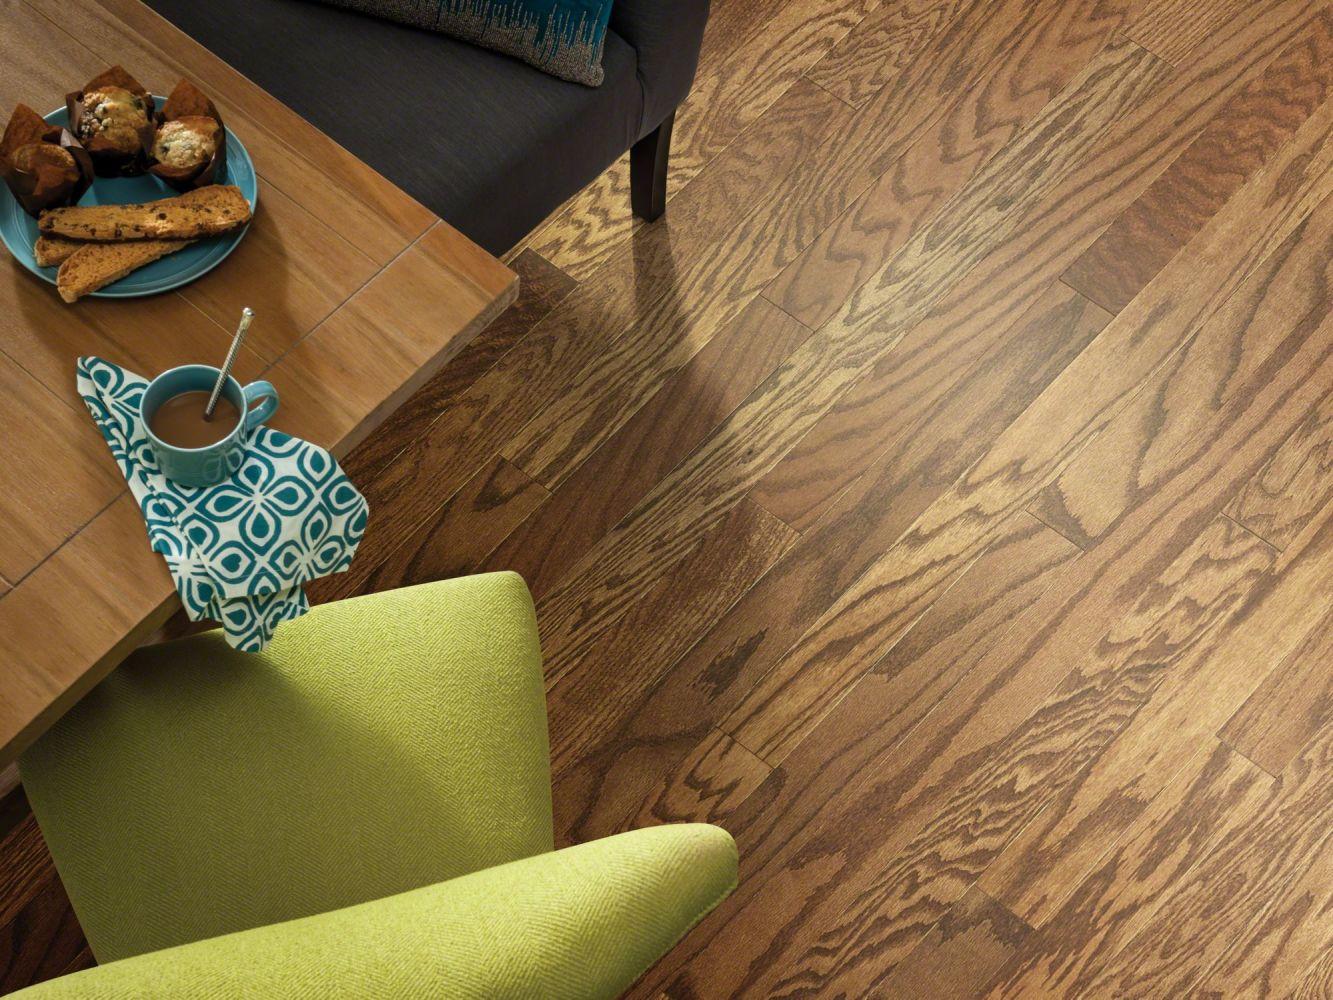 Shaw Floors Home Fn Gold Hardwood Rhapsody 5 Leather 00914_HW675